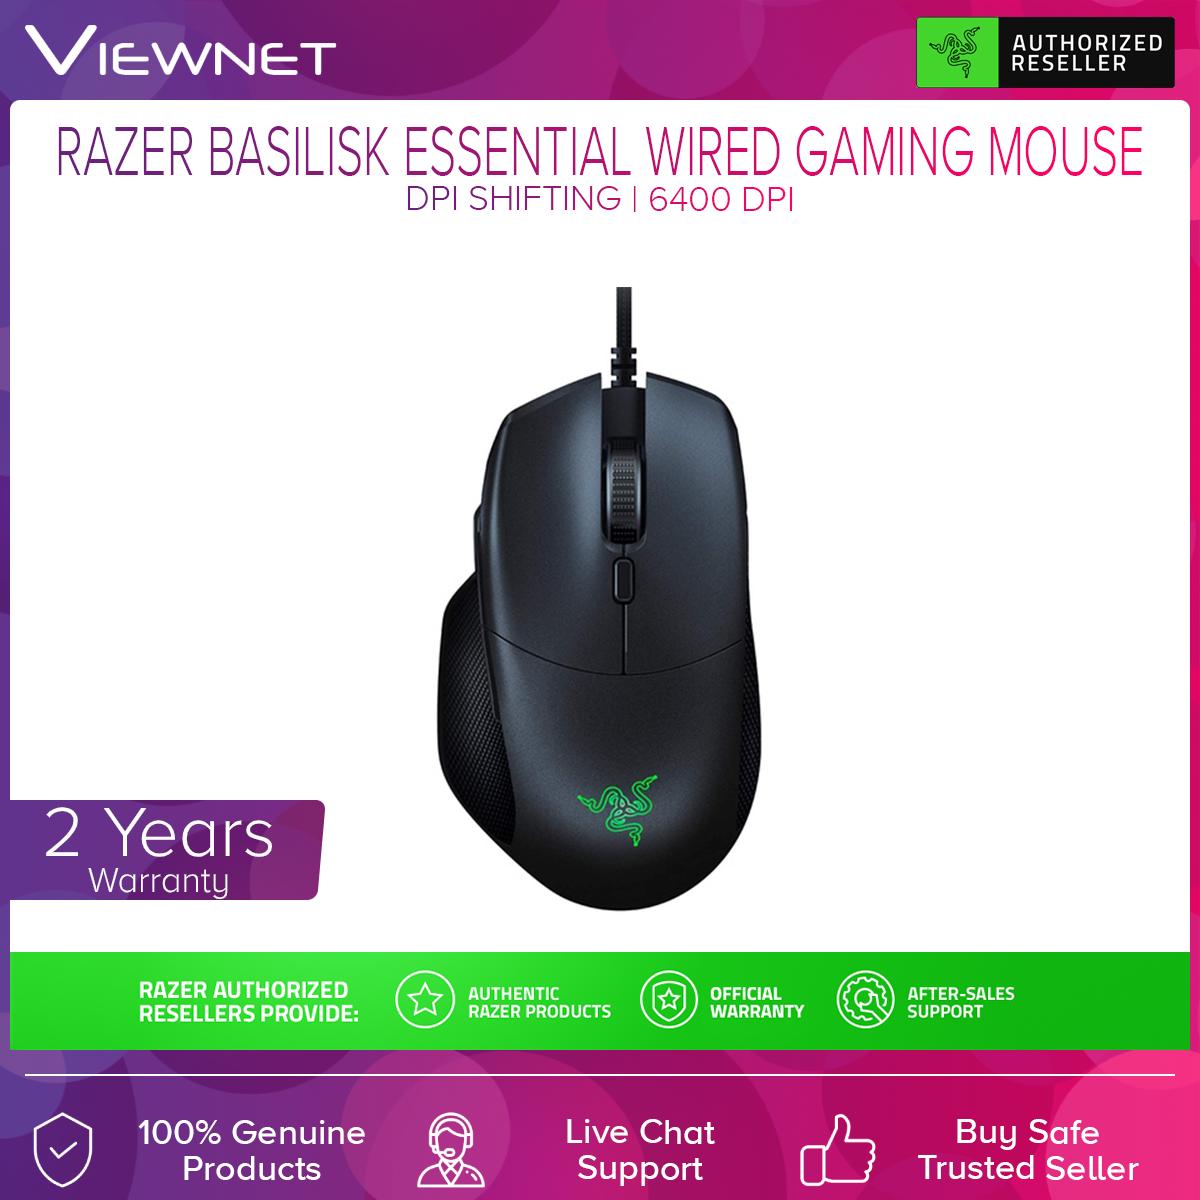 Razer RZ01-02650100-R3M1 Wired Basilisk Essential Gaming Mouse -6400 DPI